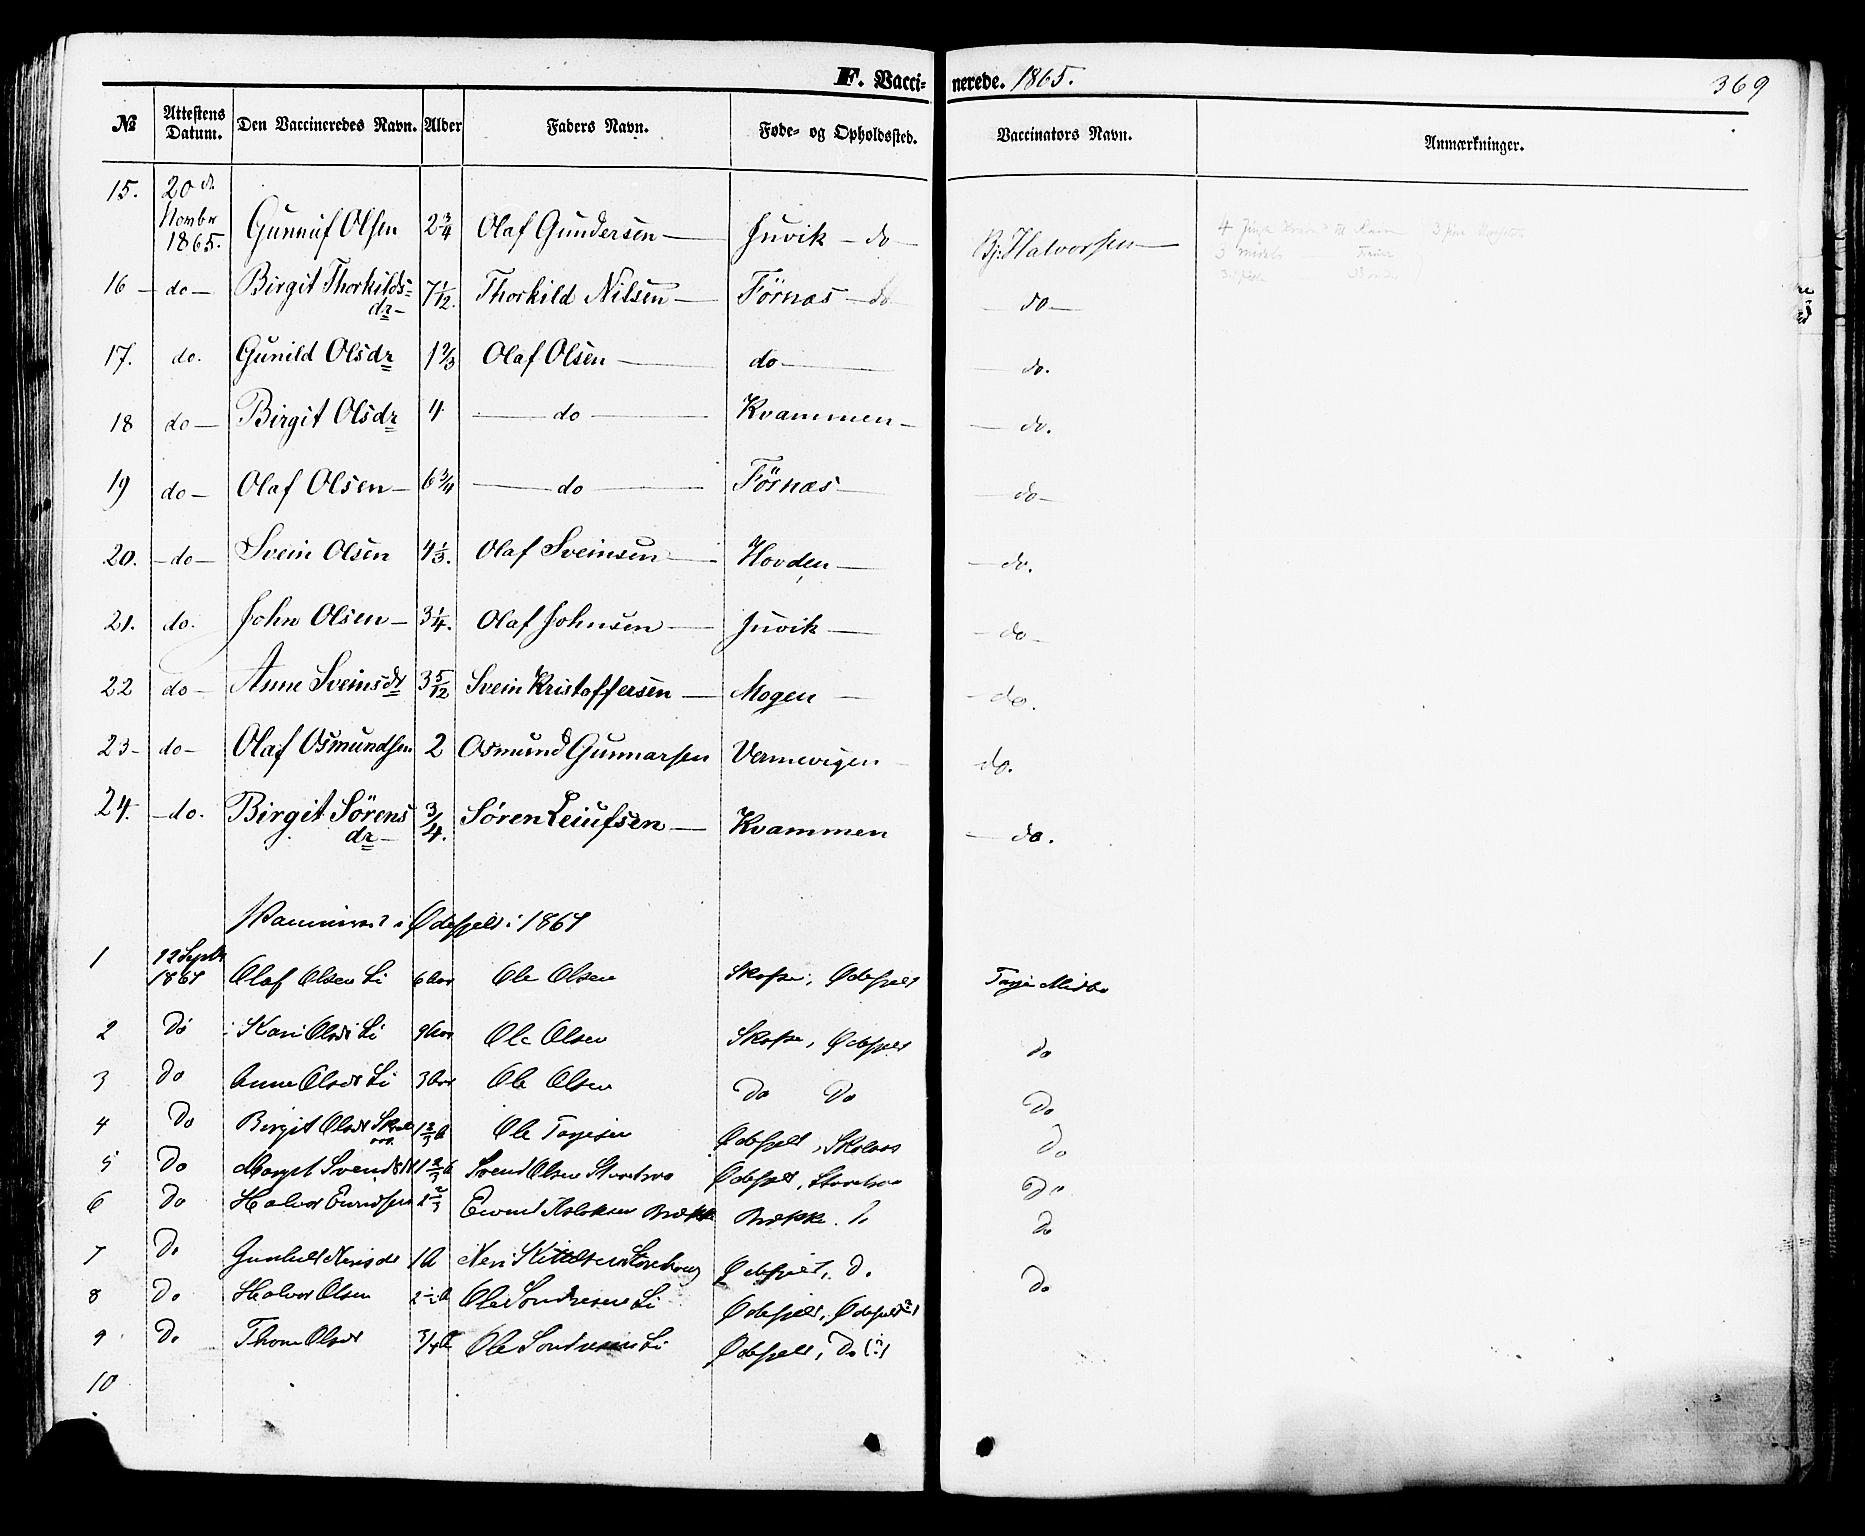 SAKO, Rauland kirkebøker, F/Fa/L0003: Ministerialbok nr. 3, 1859-1886, s. 369